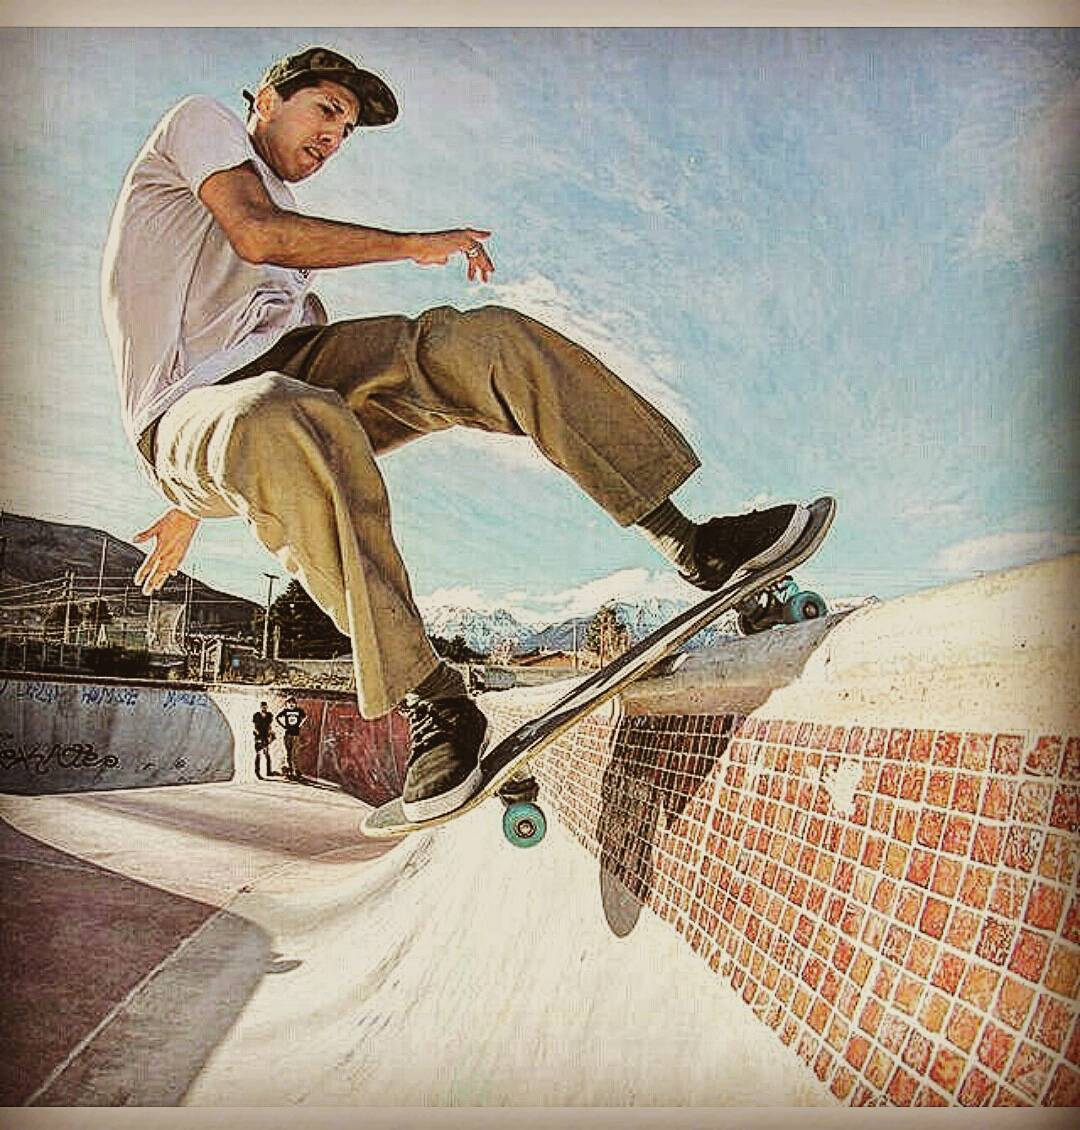 @nicolas_hernandez_ #fsdisaster #poolcoping en la enorme pileta de #esquel #AriseTrucks #believeskateboards